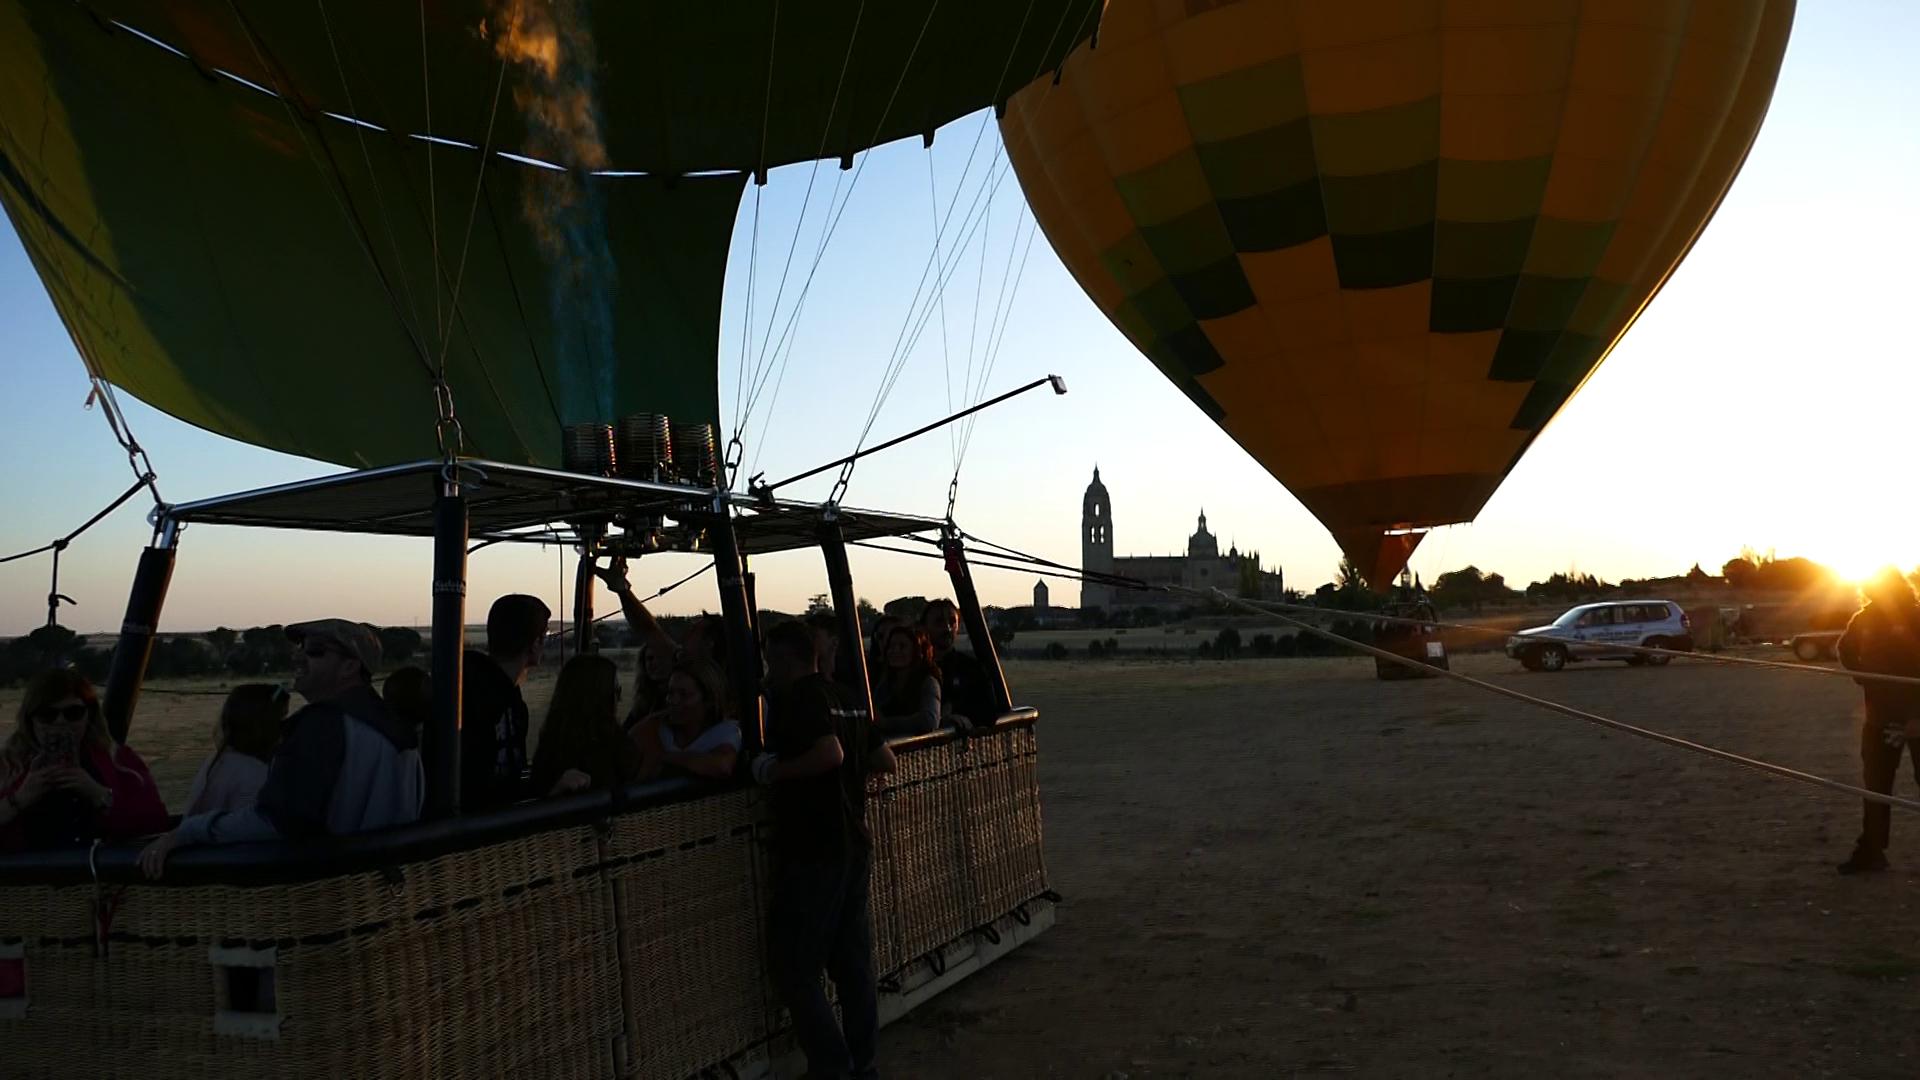 Paseo en globo por Segovia 03/08/2019